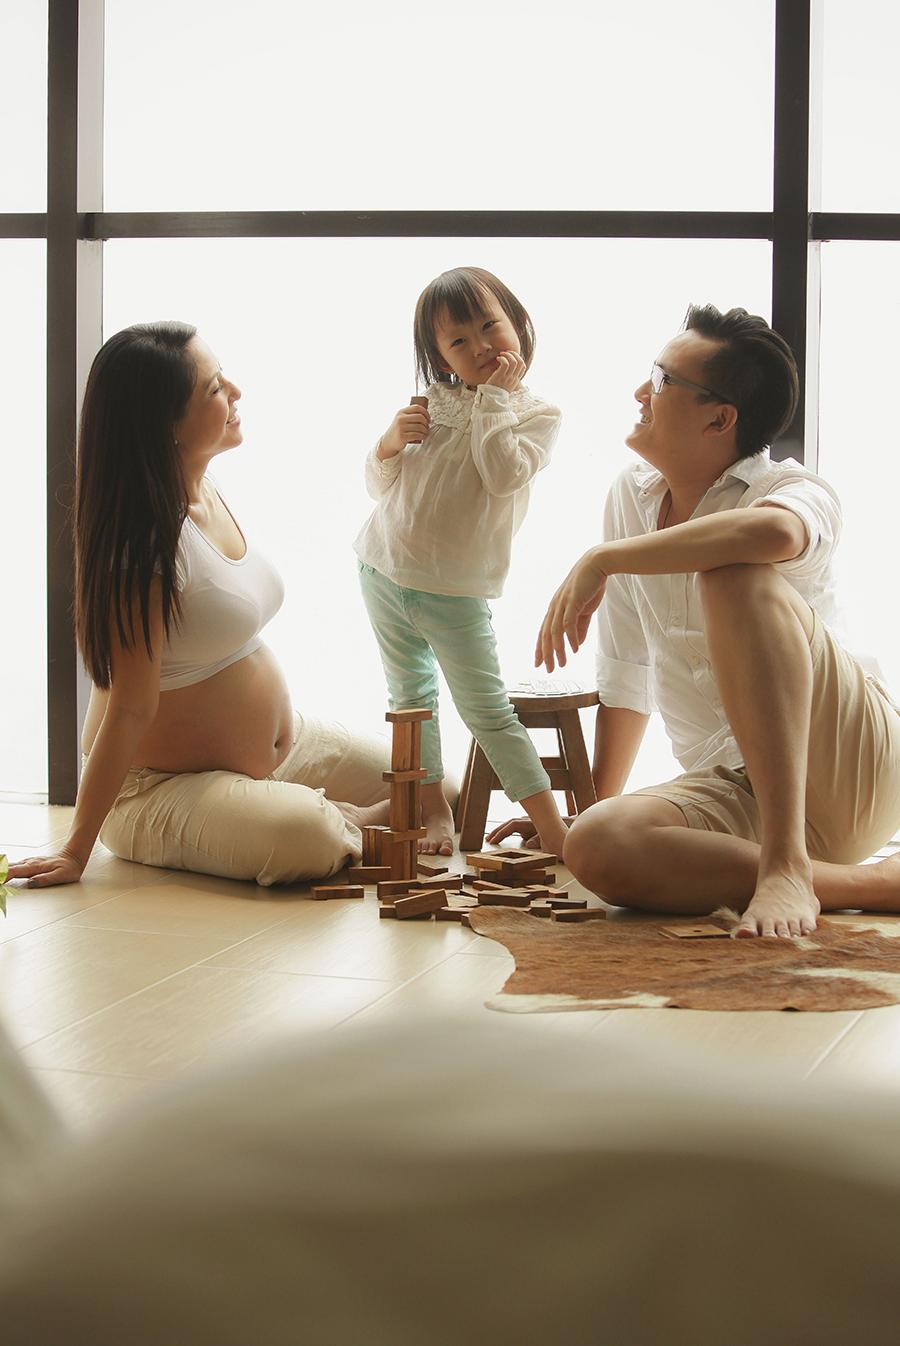 maternity + family portrait photography by kurt ahs . 9128.jpg